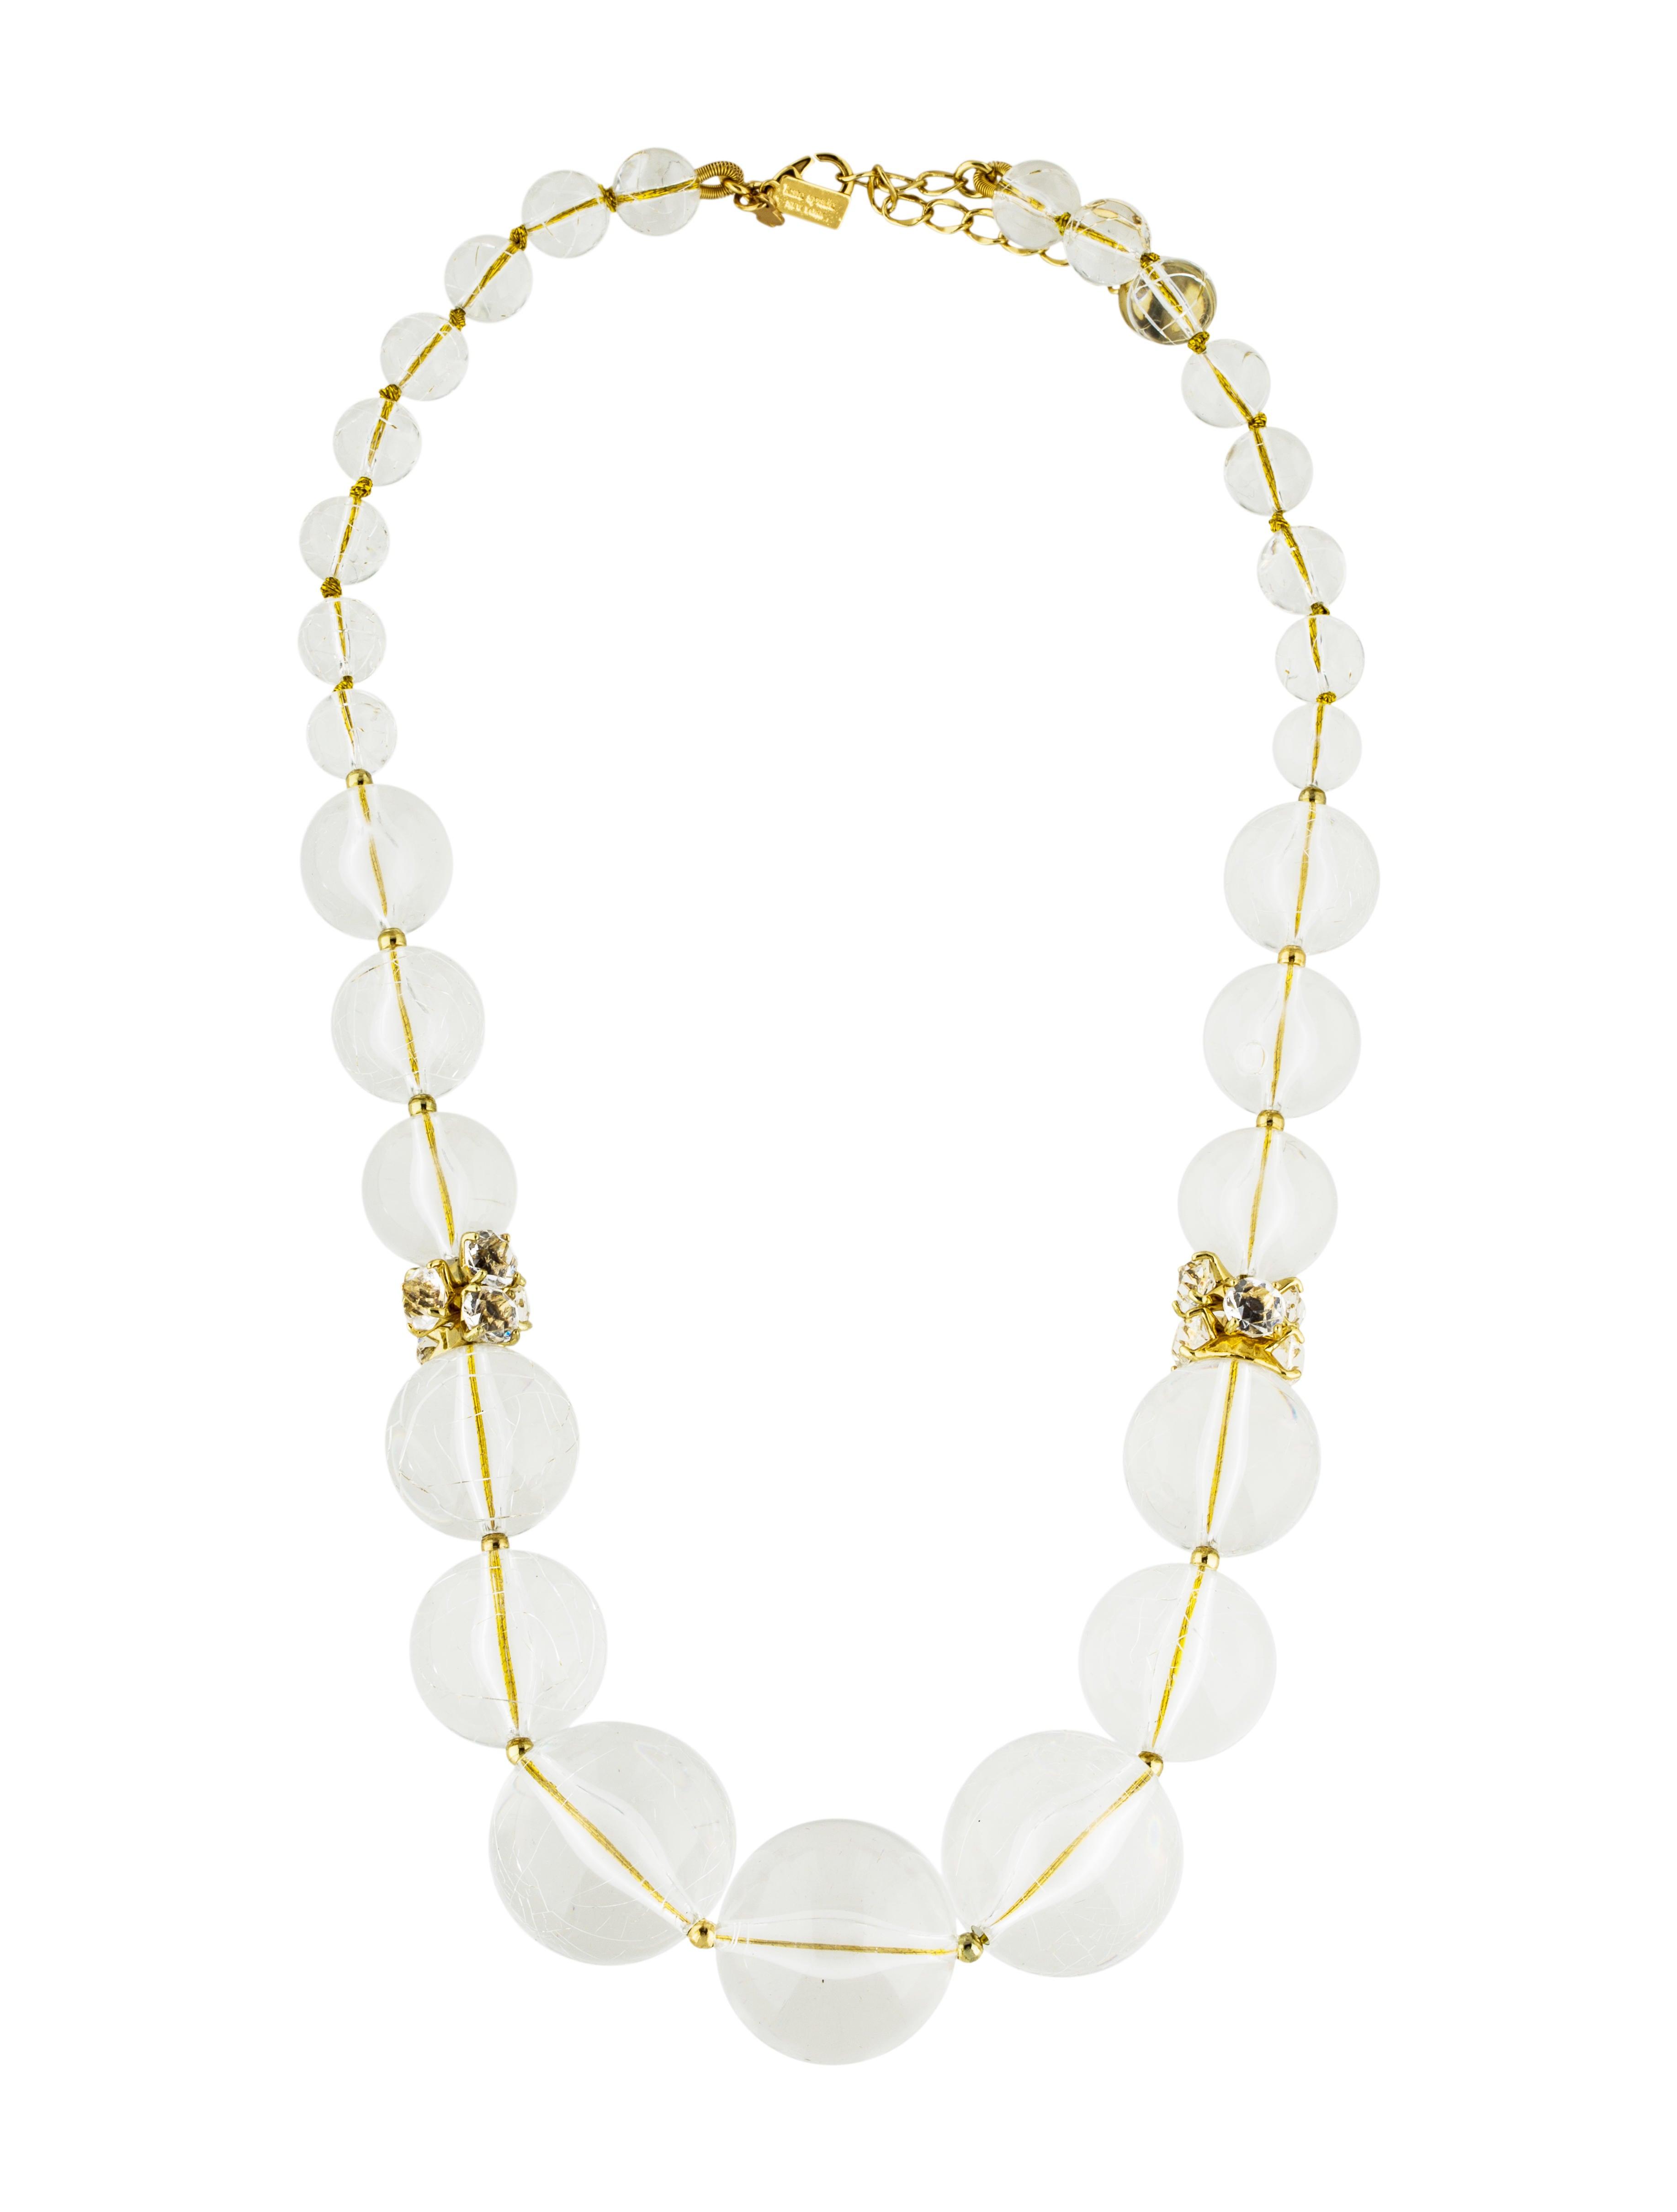 kate spade new york beaded necklace necklaces wka61521. Black Bedroom Furniture Sets. Home Design Ideas